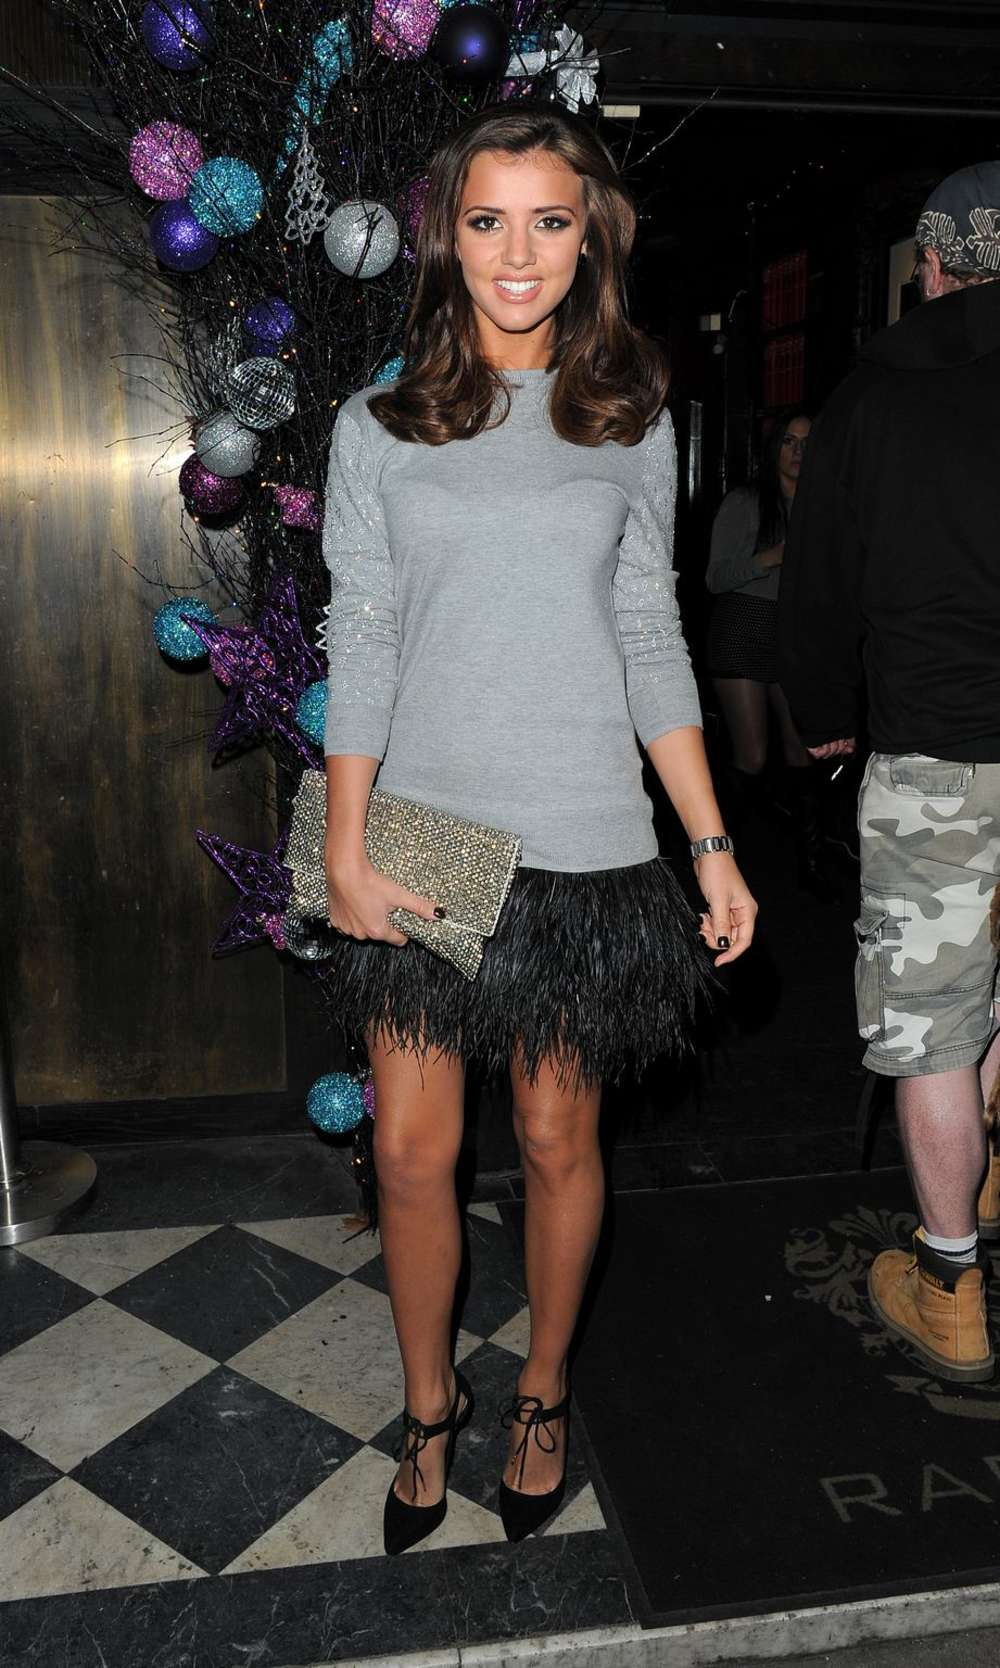 Lucy Mecklenburgh at Raffles Nightclub for the KAZAM Tornado 348 in London